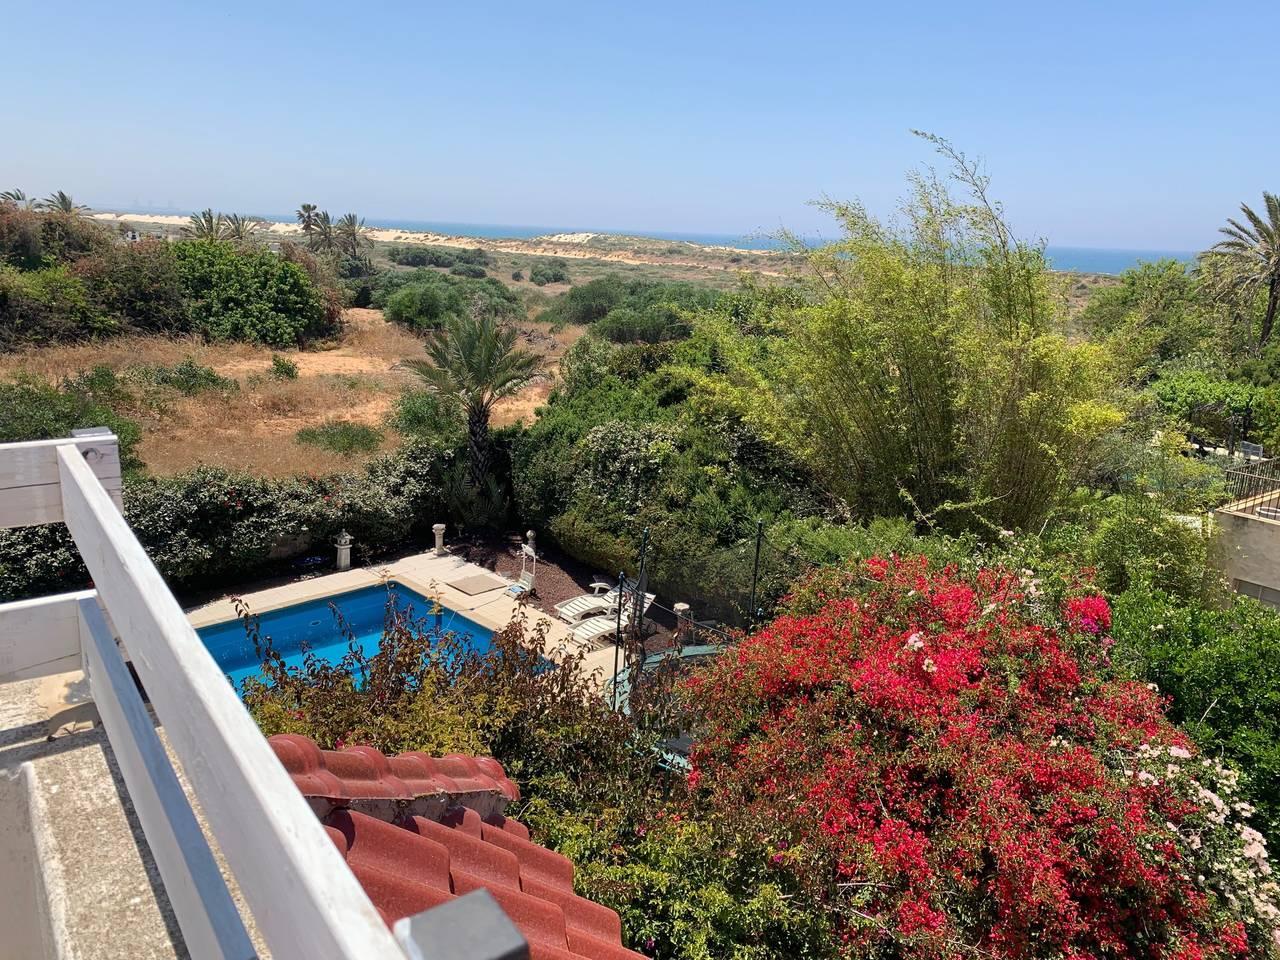 Apartment Dream house by the sea in Caesarea photo 25970043